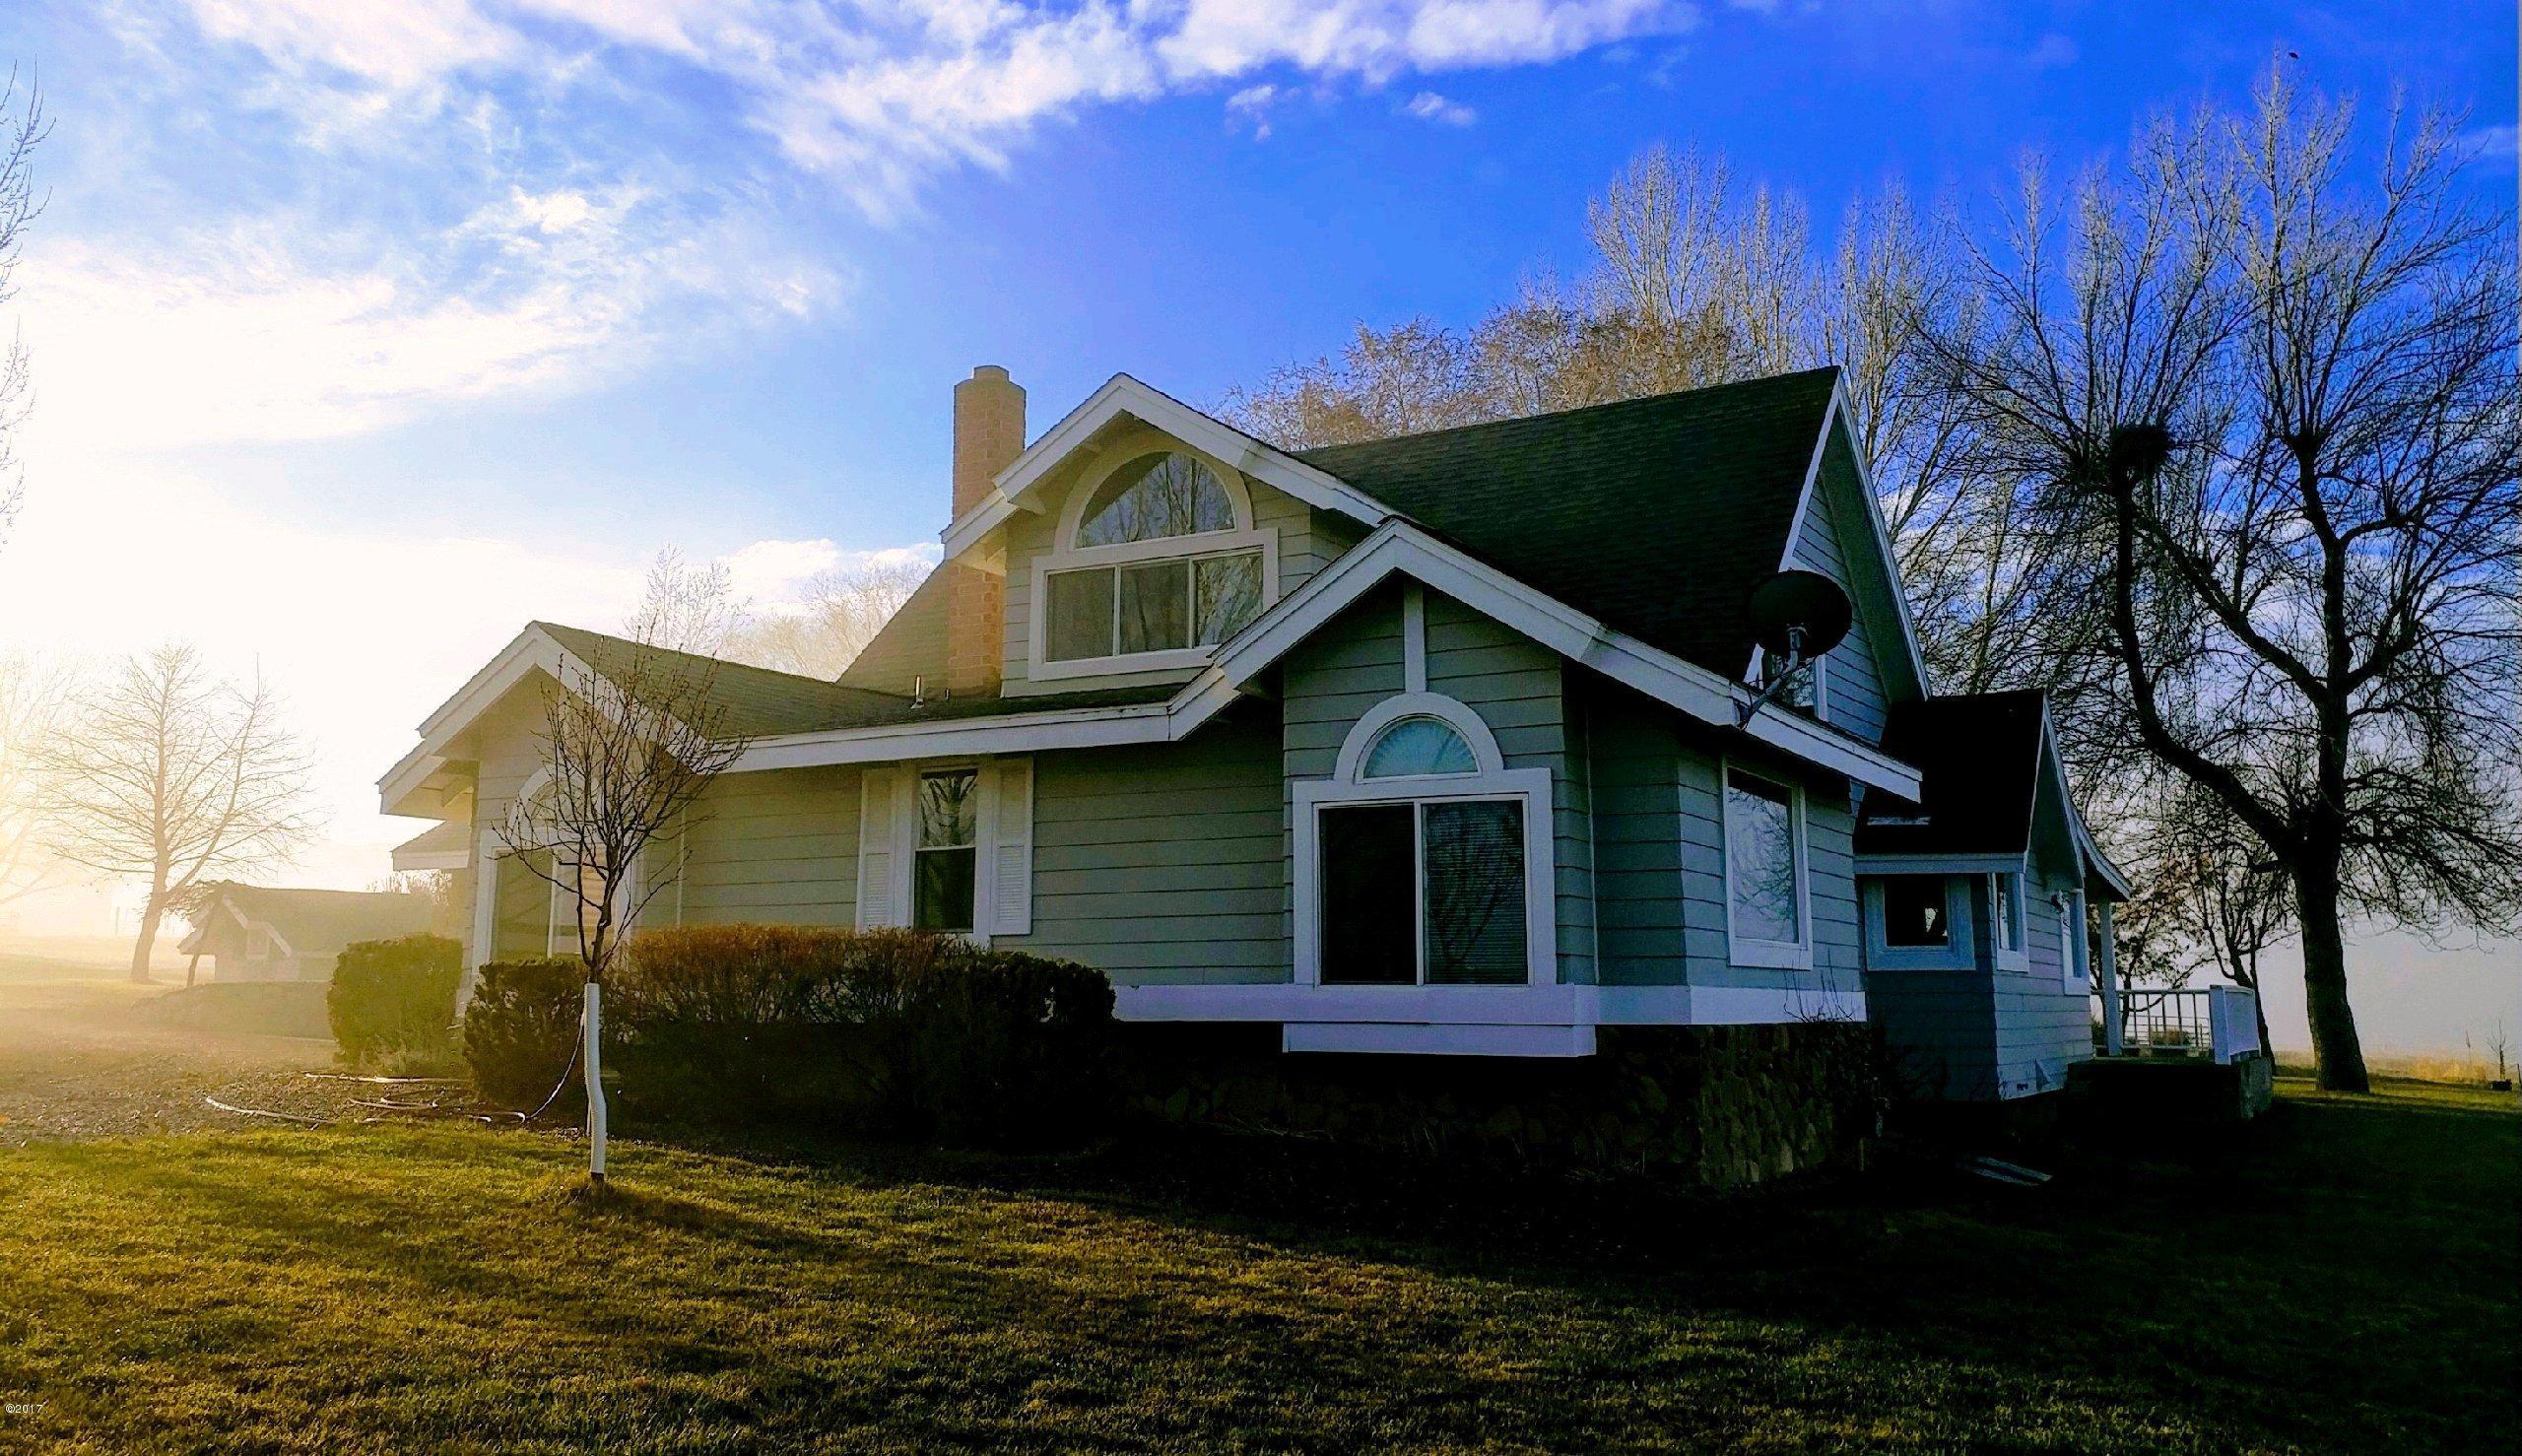 Additional photo for property listing at 599 & 605 Popham Lane  Corvallis, Montana 59828 United States